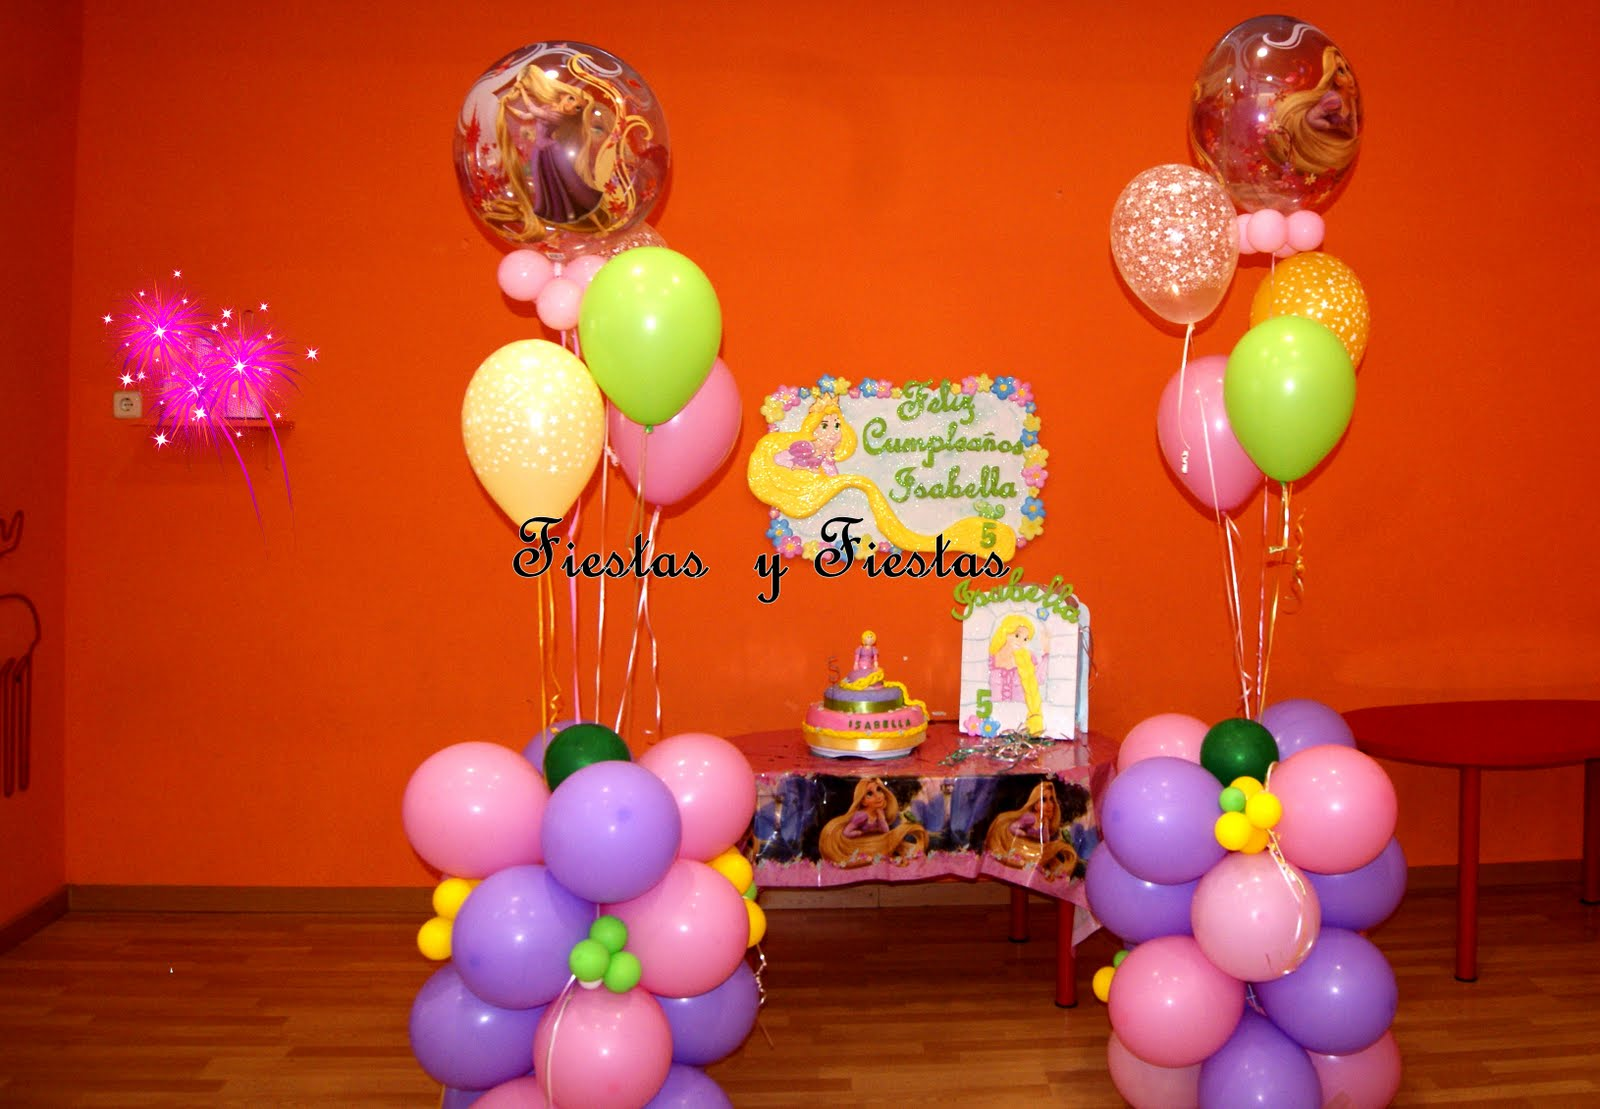 Decoracion Rapunzel Fiesta ~ Decoraci?n para Fiestas en Icopor ? Poliespan RAPUNZEL